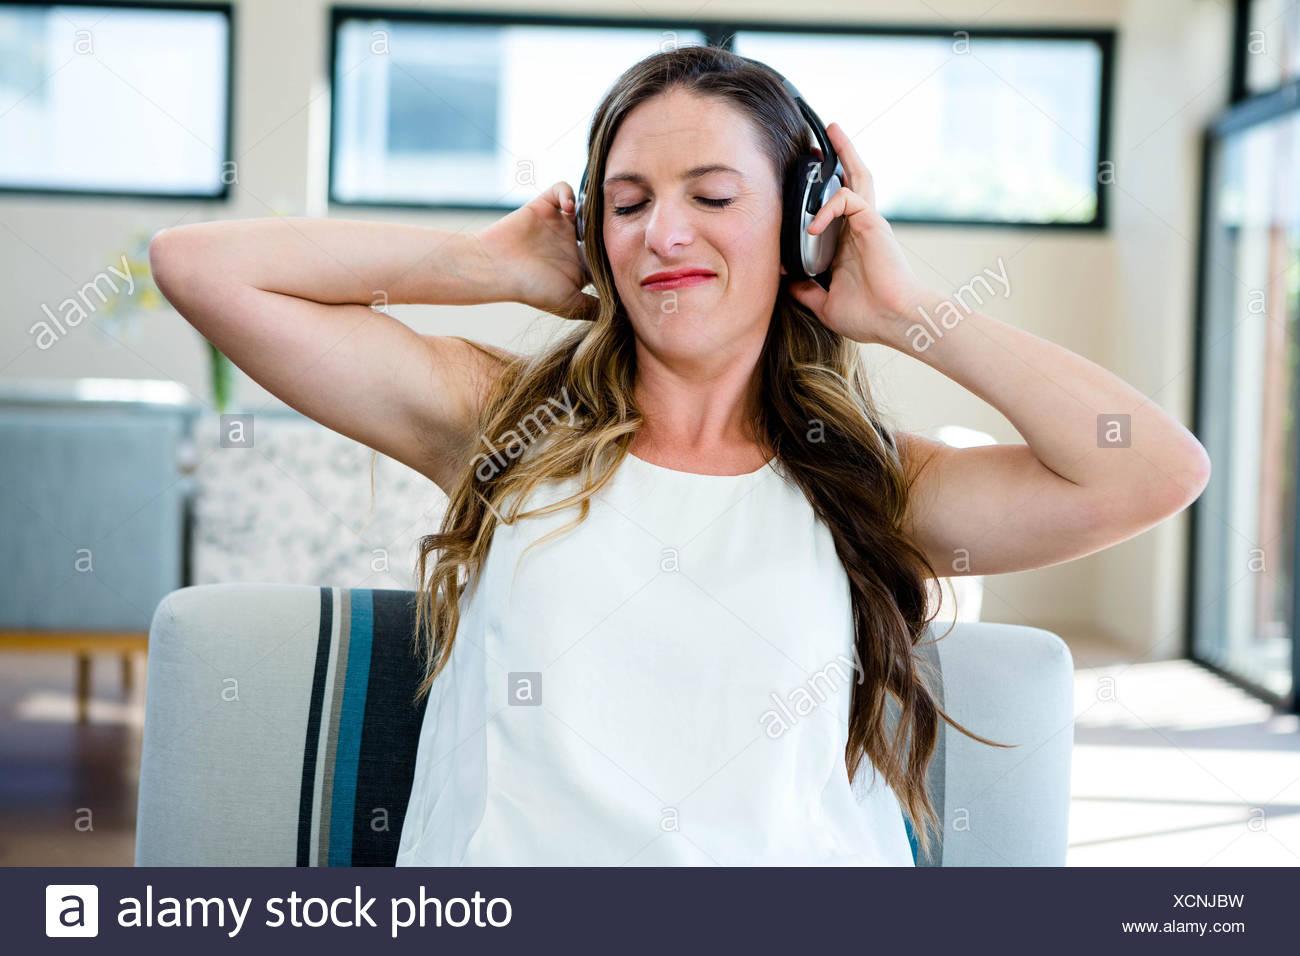 woman grimacing listening to headphone - Stock Image